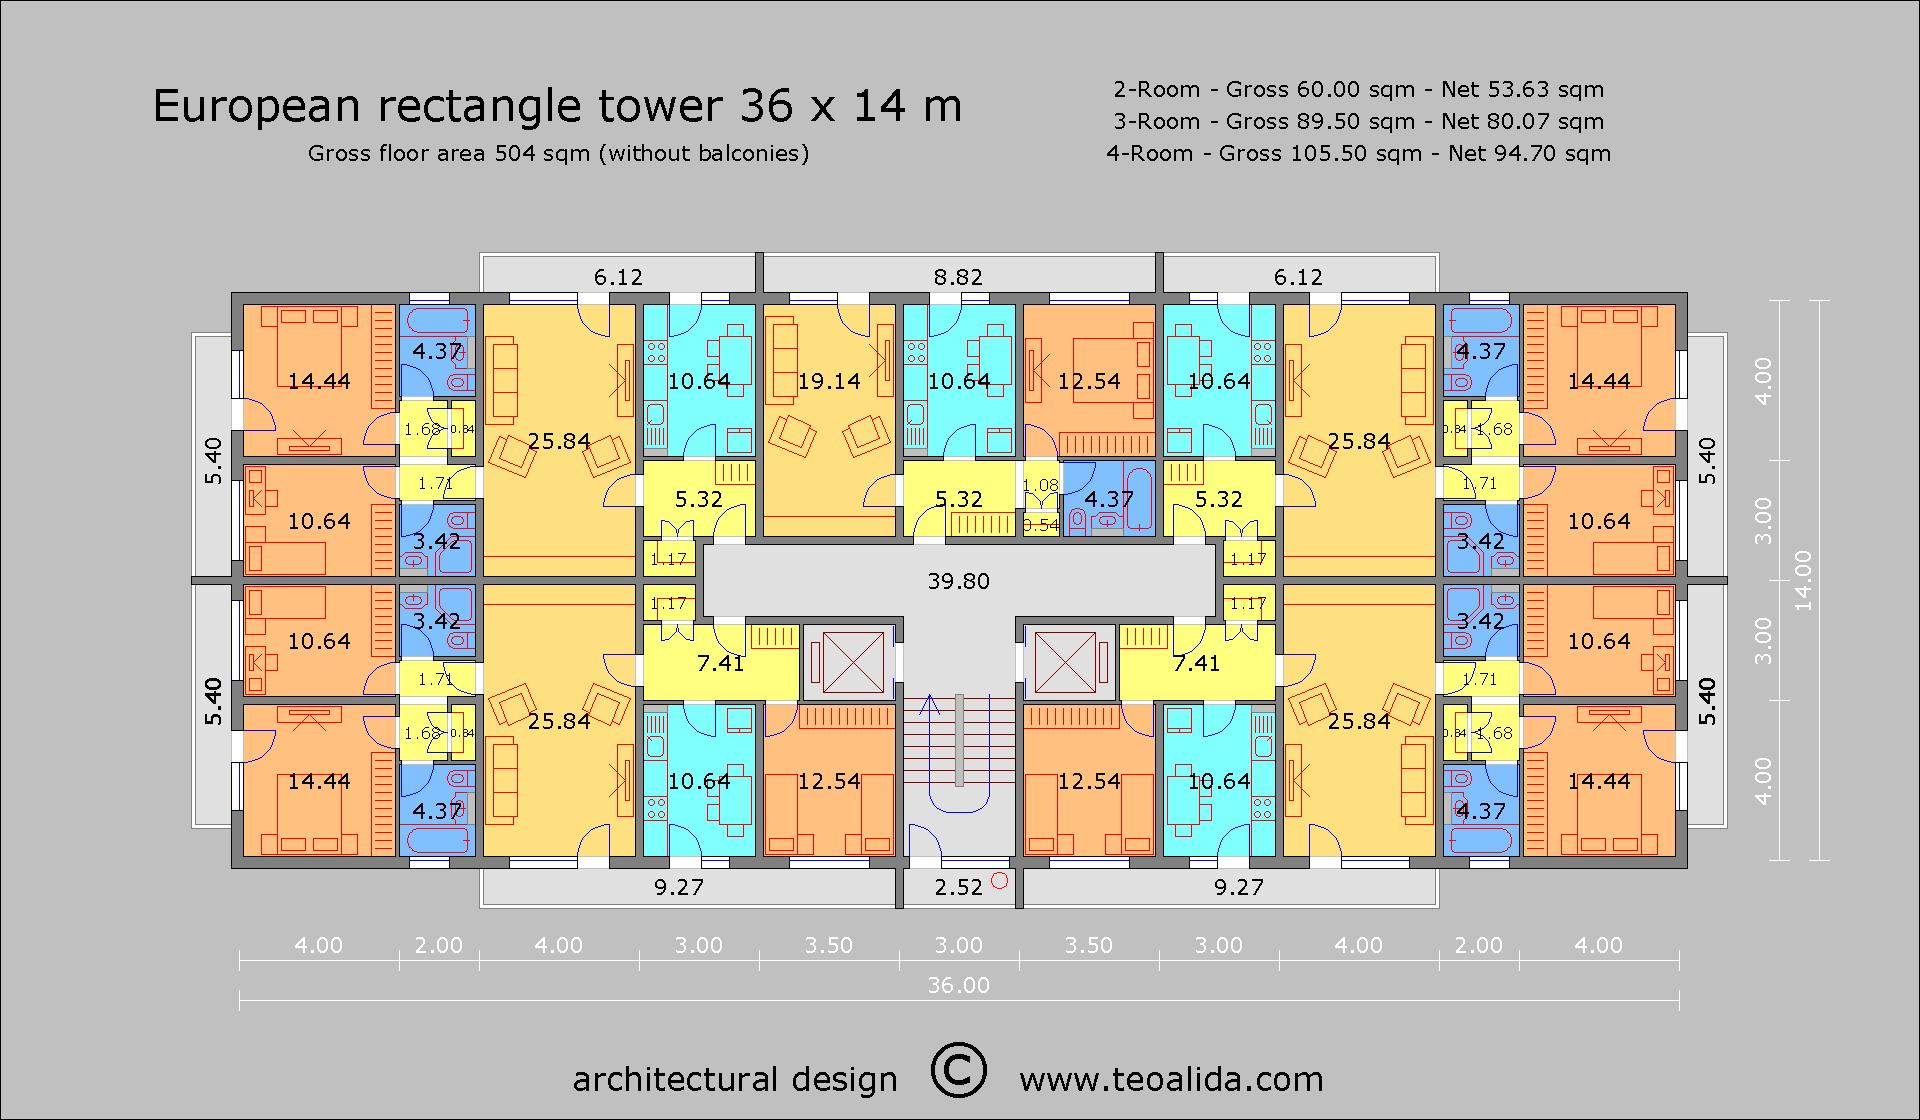 European Rectangle Tower 36 x 14 m